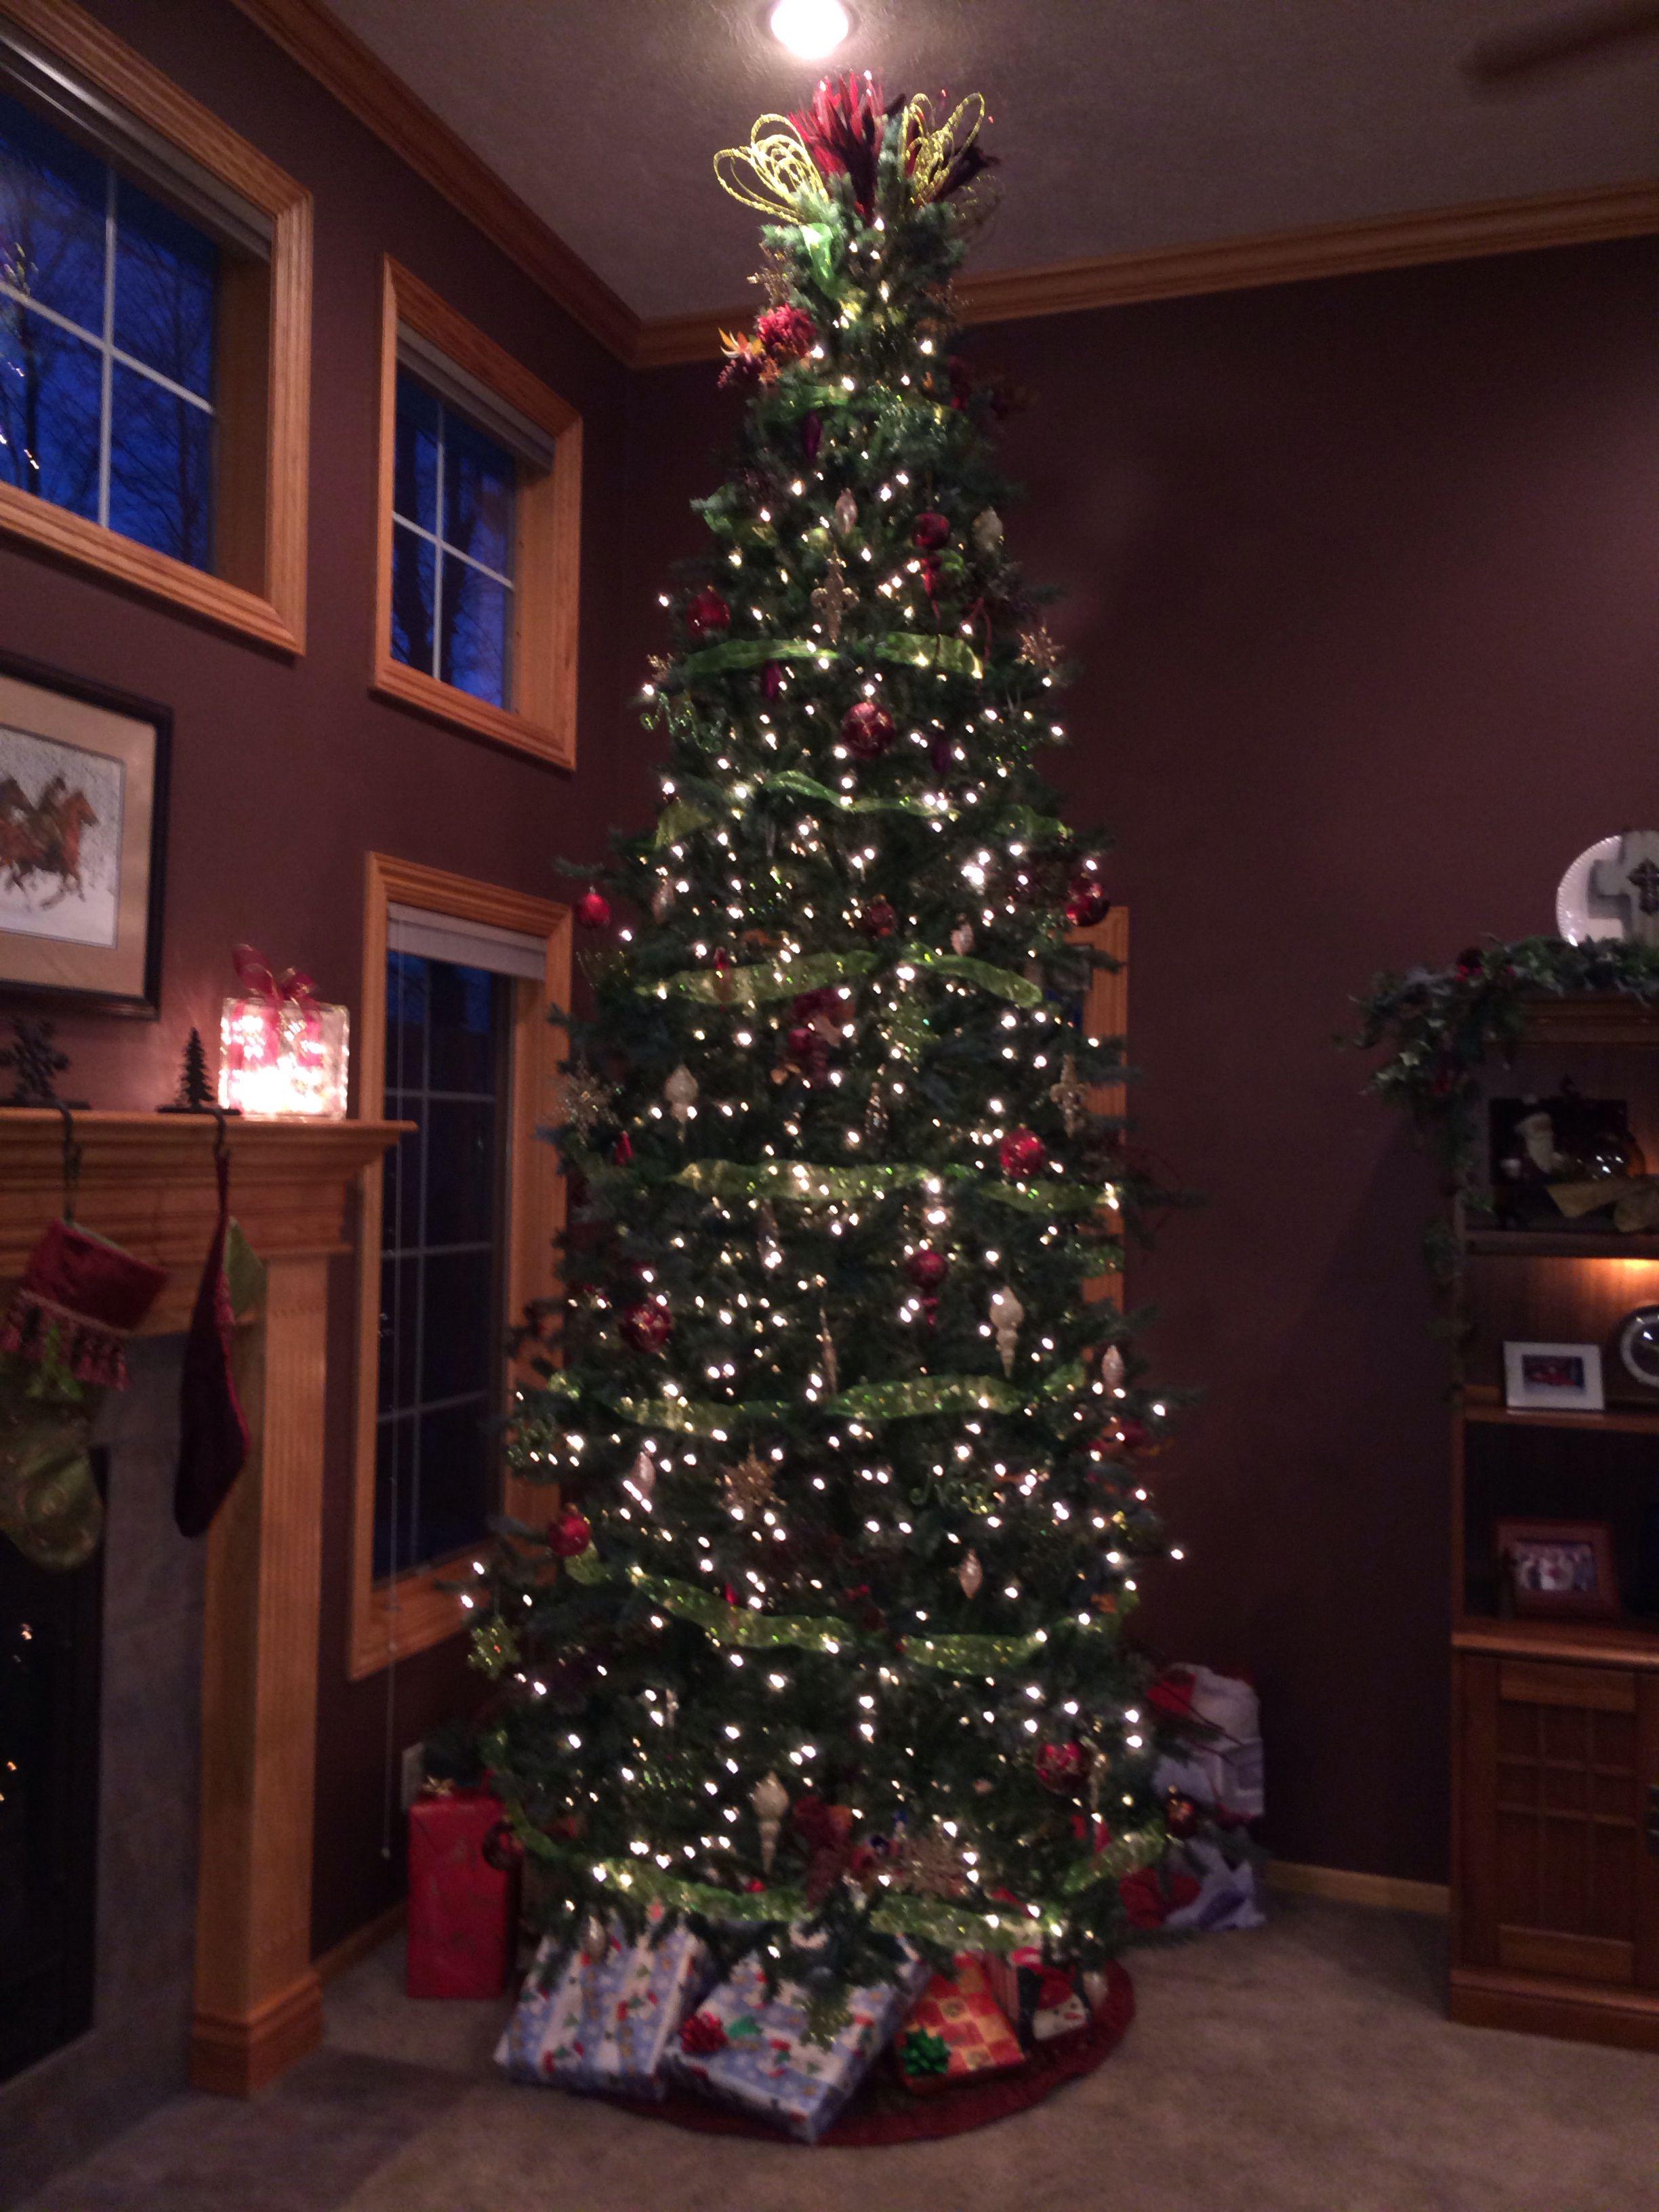 Burgundy And Green Christmas Tree 12 Foot Slim Fit Slim Christmas Tree Green Christmas Tree Green Christmas